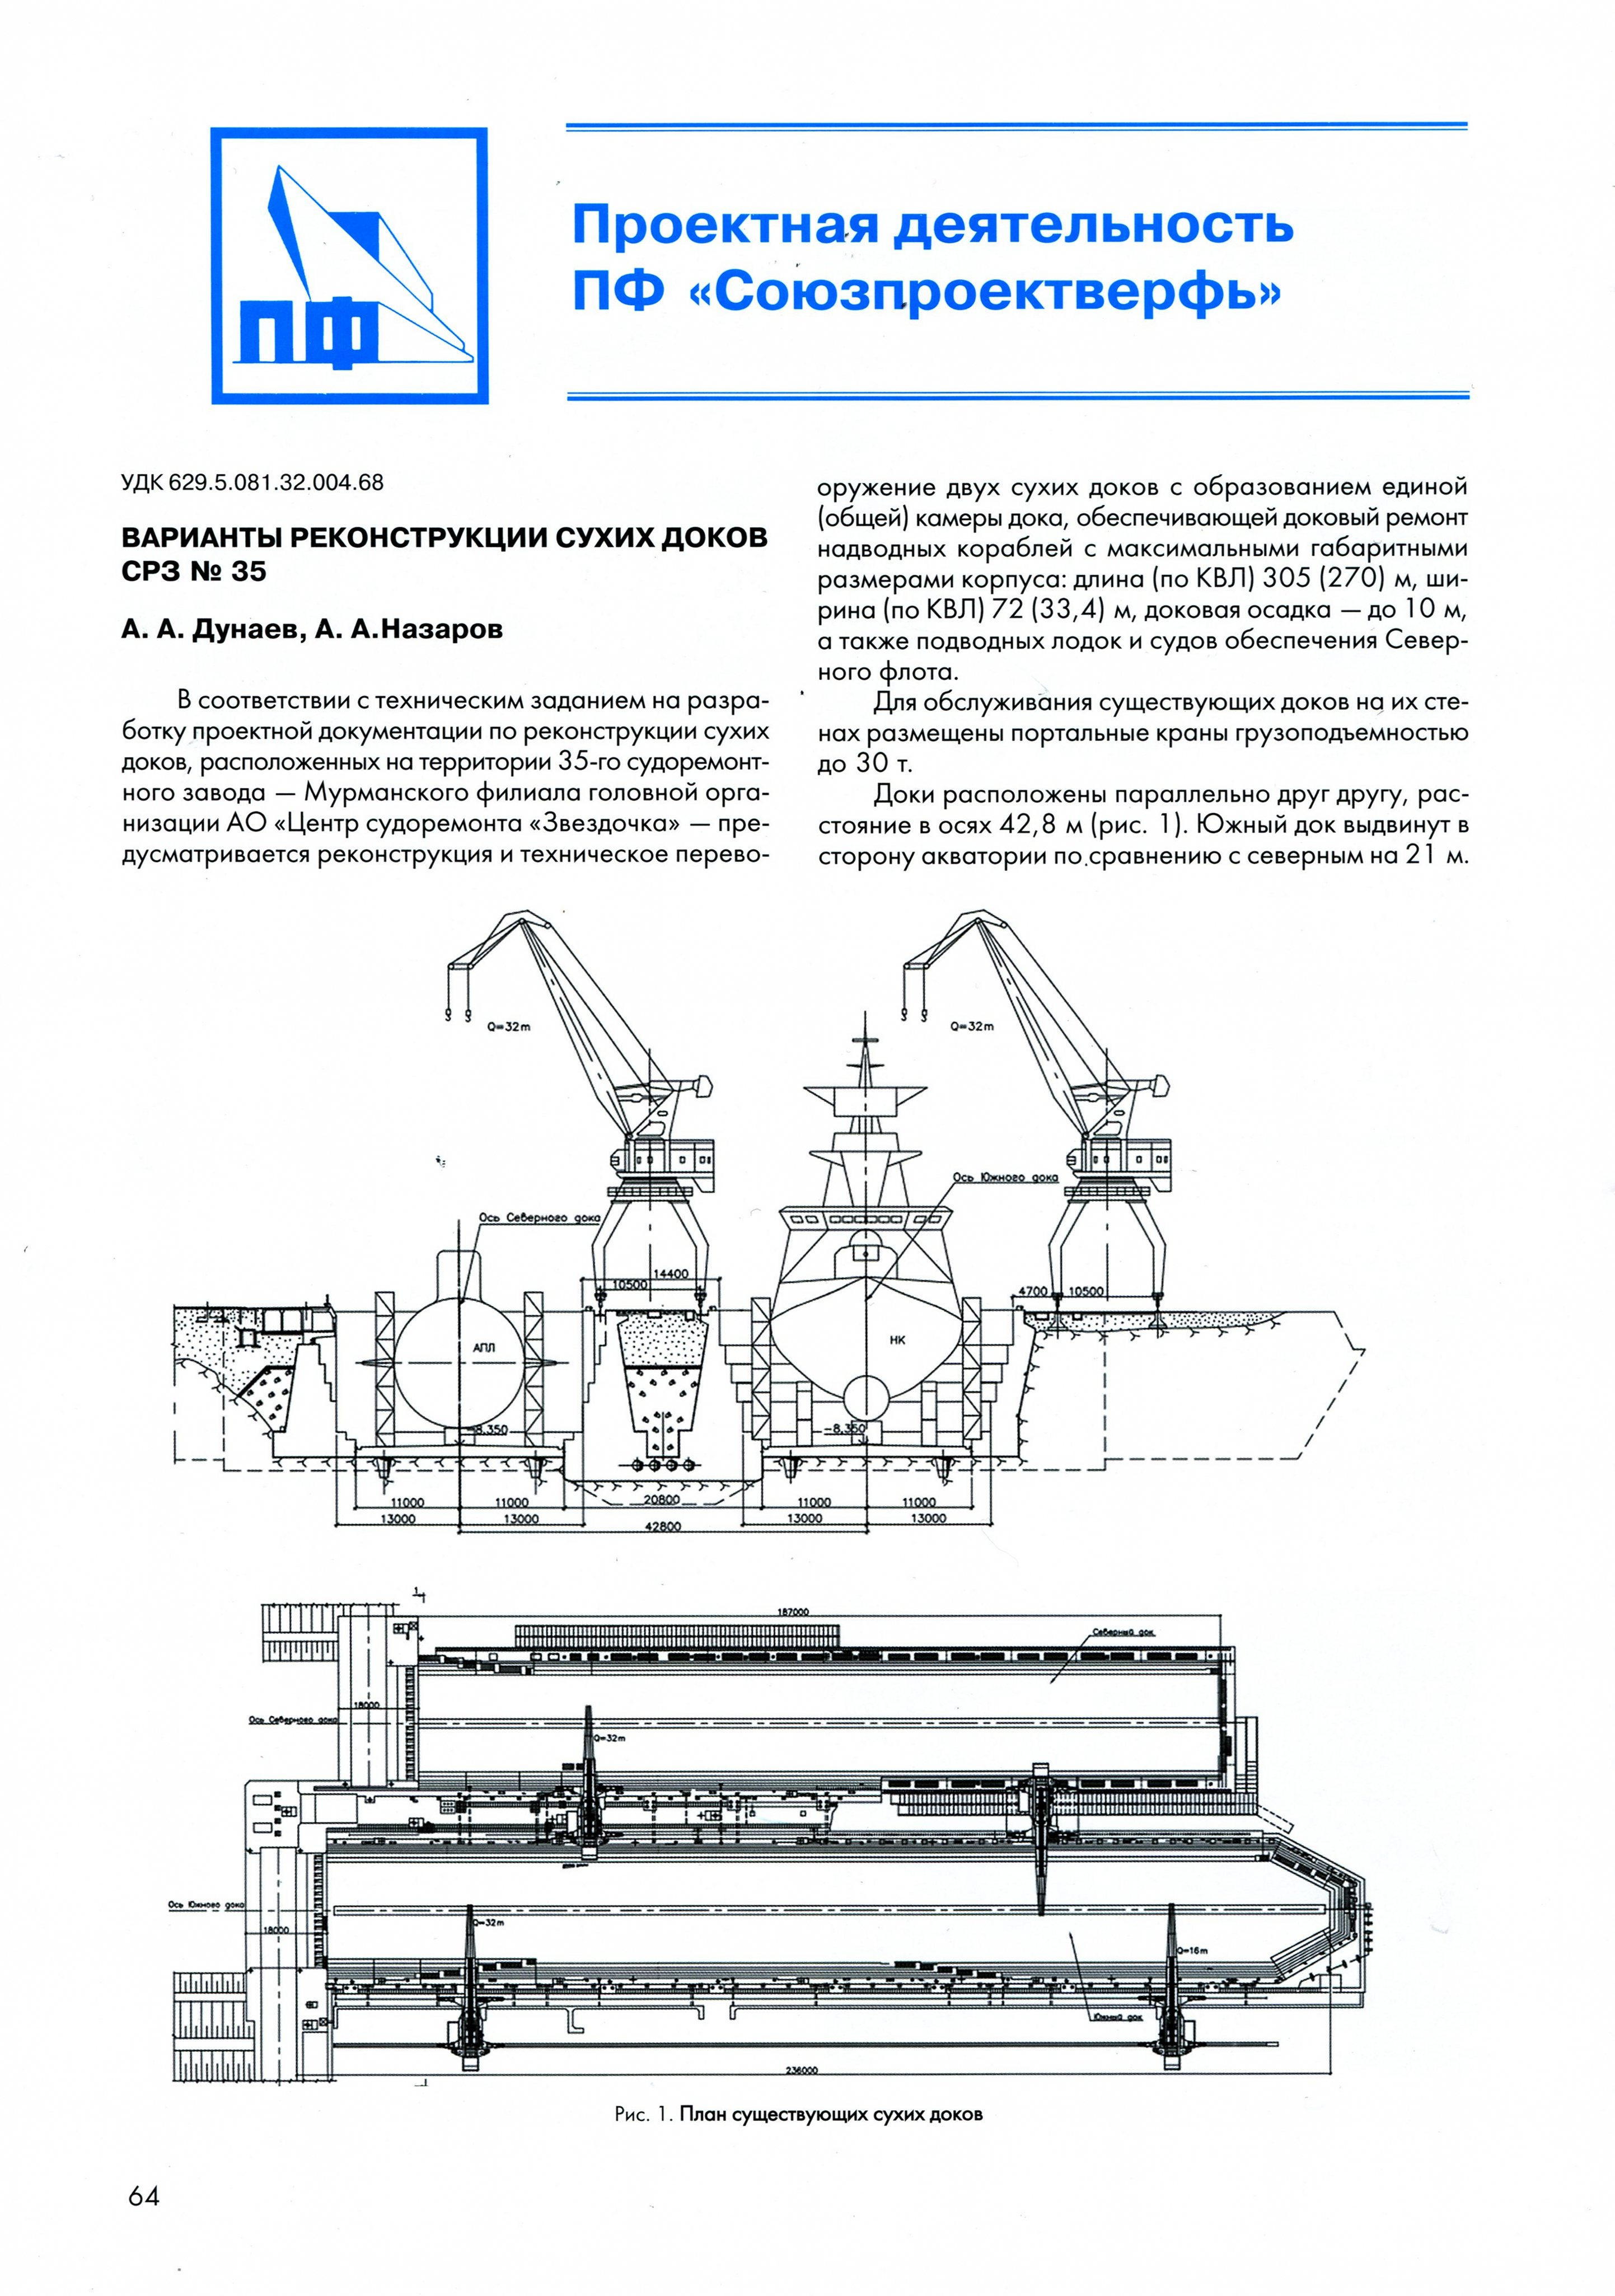 Aircraft Carrier Admiral Kuznetsov: News #2 - Page 15 6675432_original